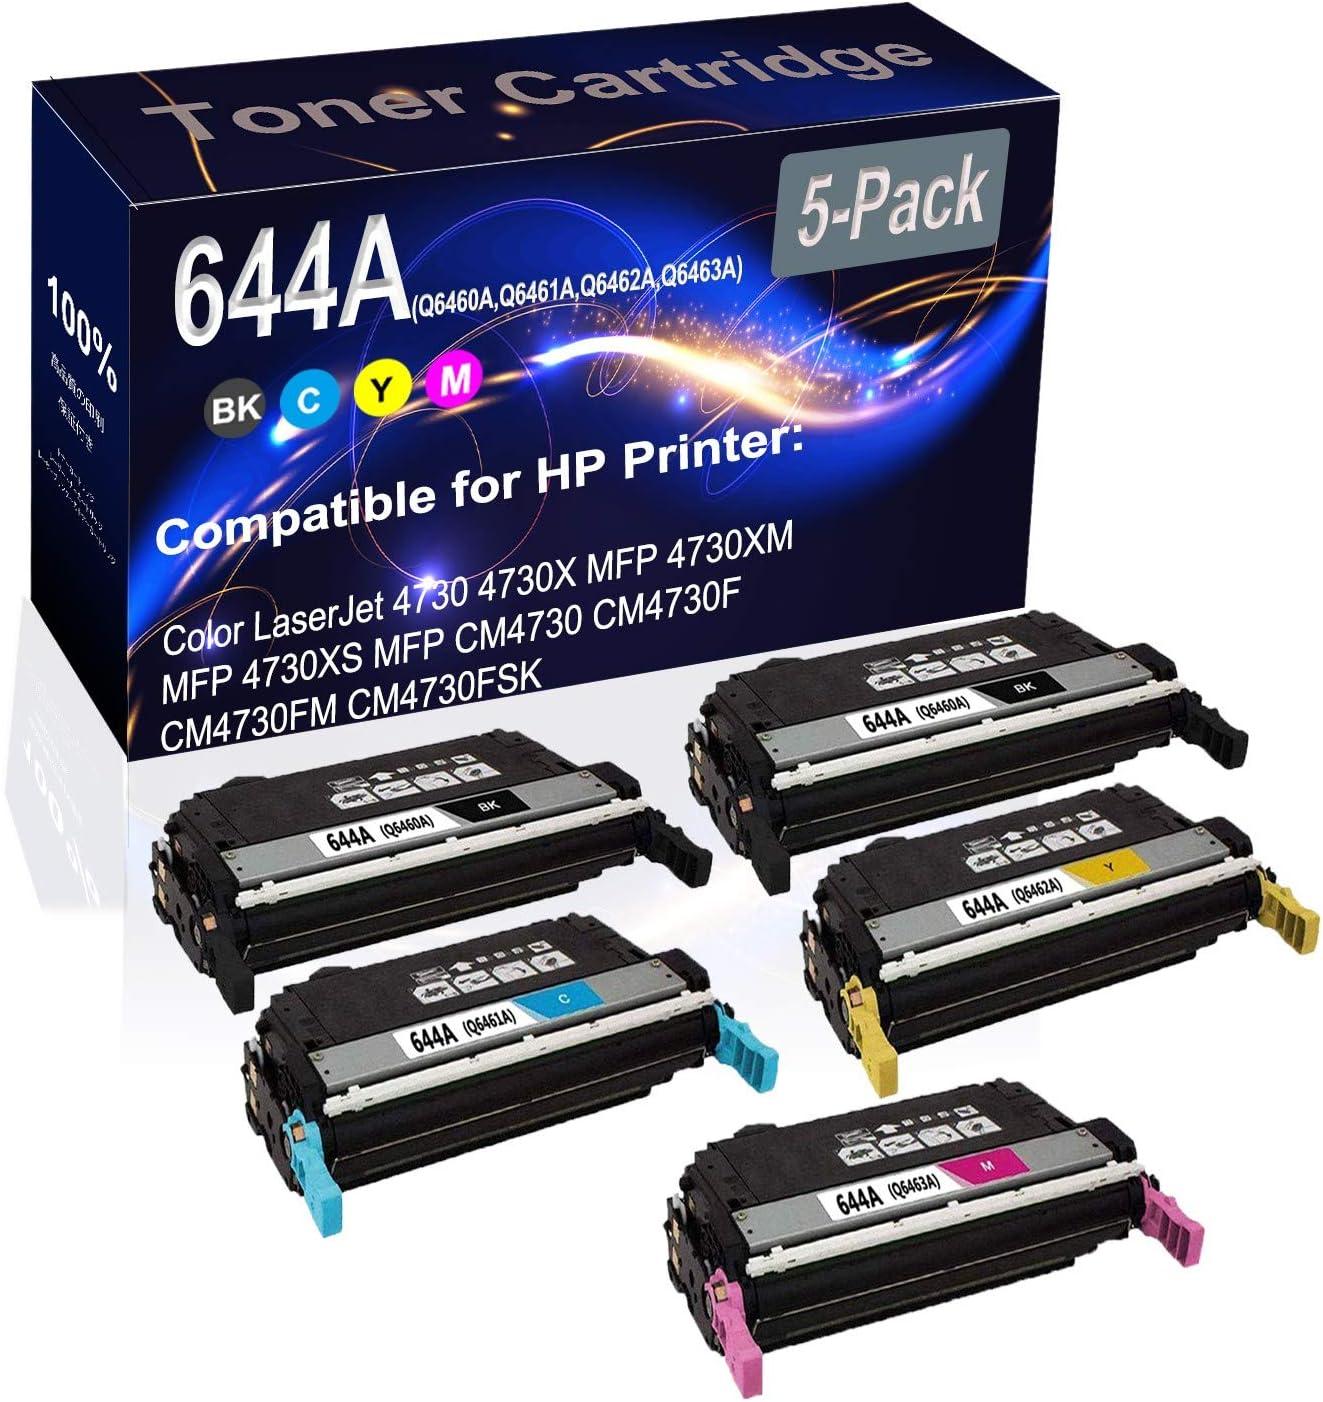 5-Pack (2BK+C+Y+M) Compatible High Yield 644A (Q6460A Q6461A Q6462A Q6463A) Printer Toner Cartridge use for HP CM4730F CM4730FM CM4730FSK Printers